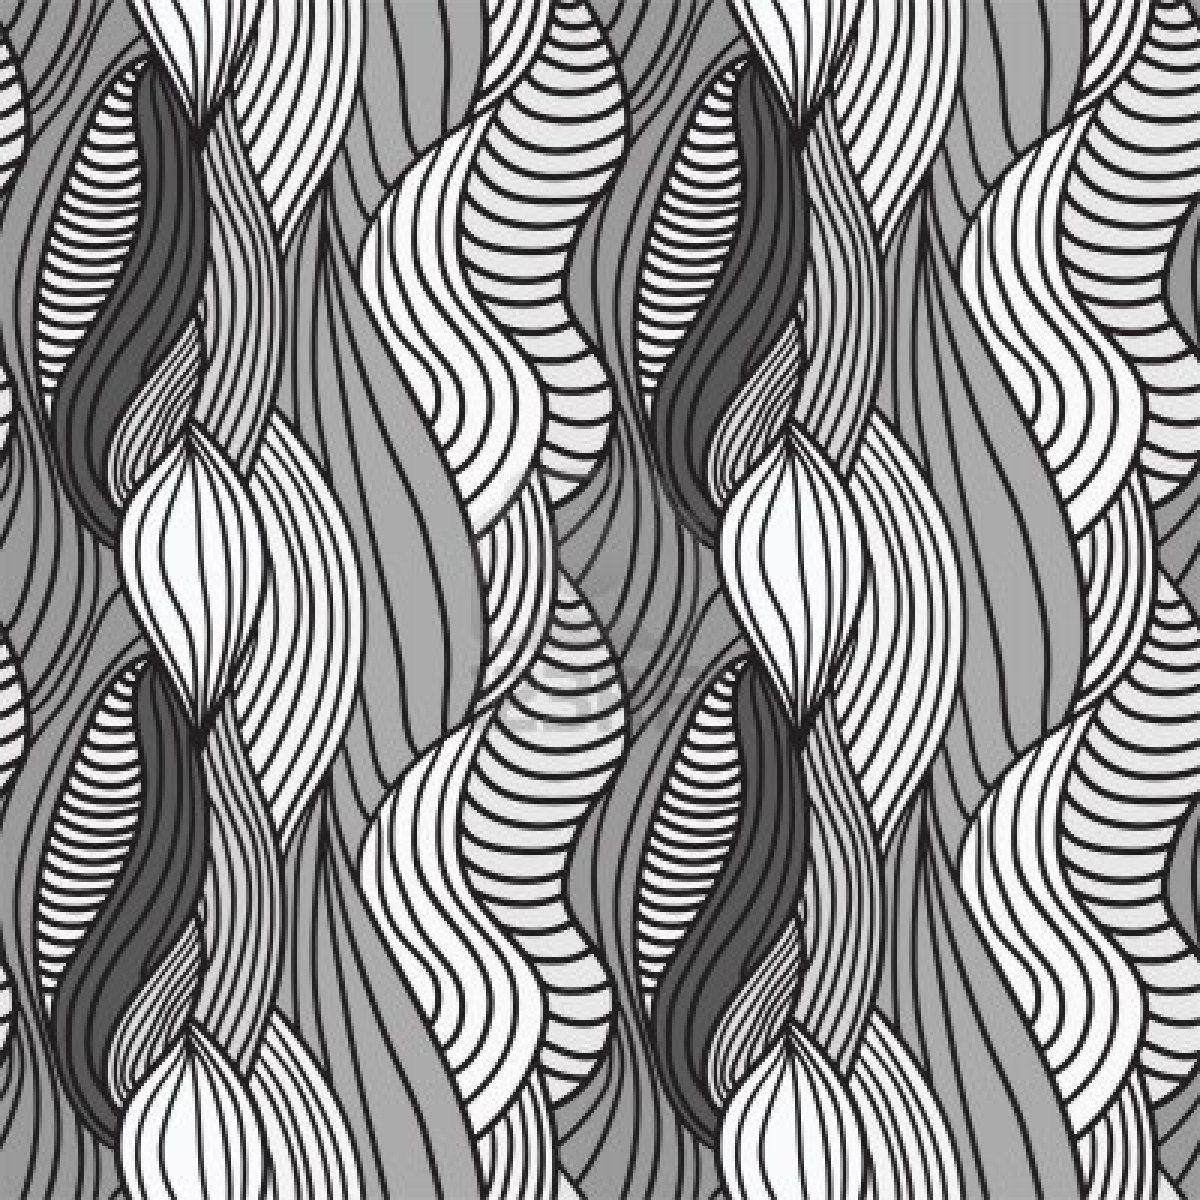 Seamless Abstract Hand Drawn Pattern Hair Background Hand Drawn Pattern How To Draw Hands Abstract